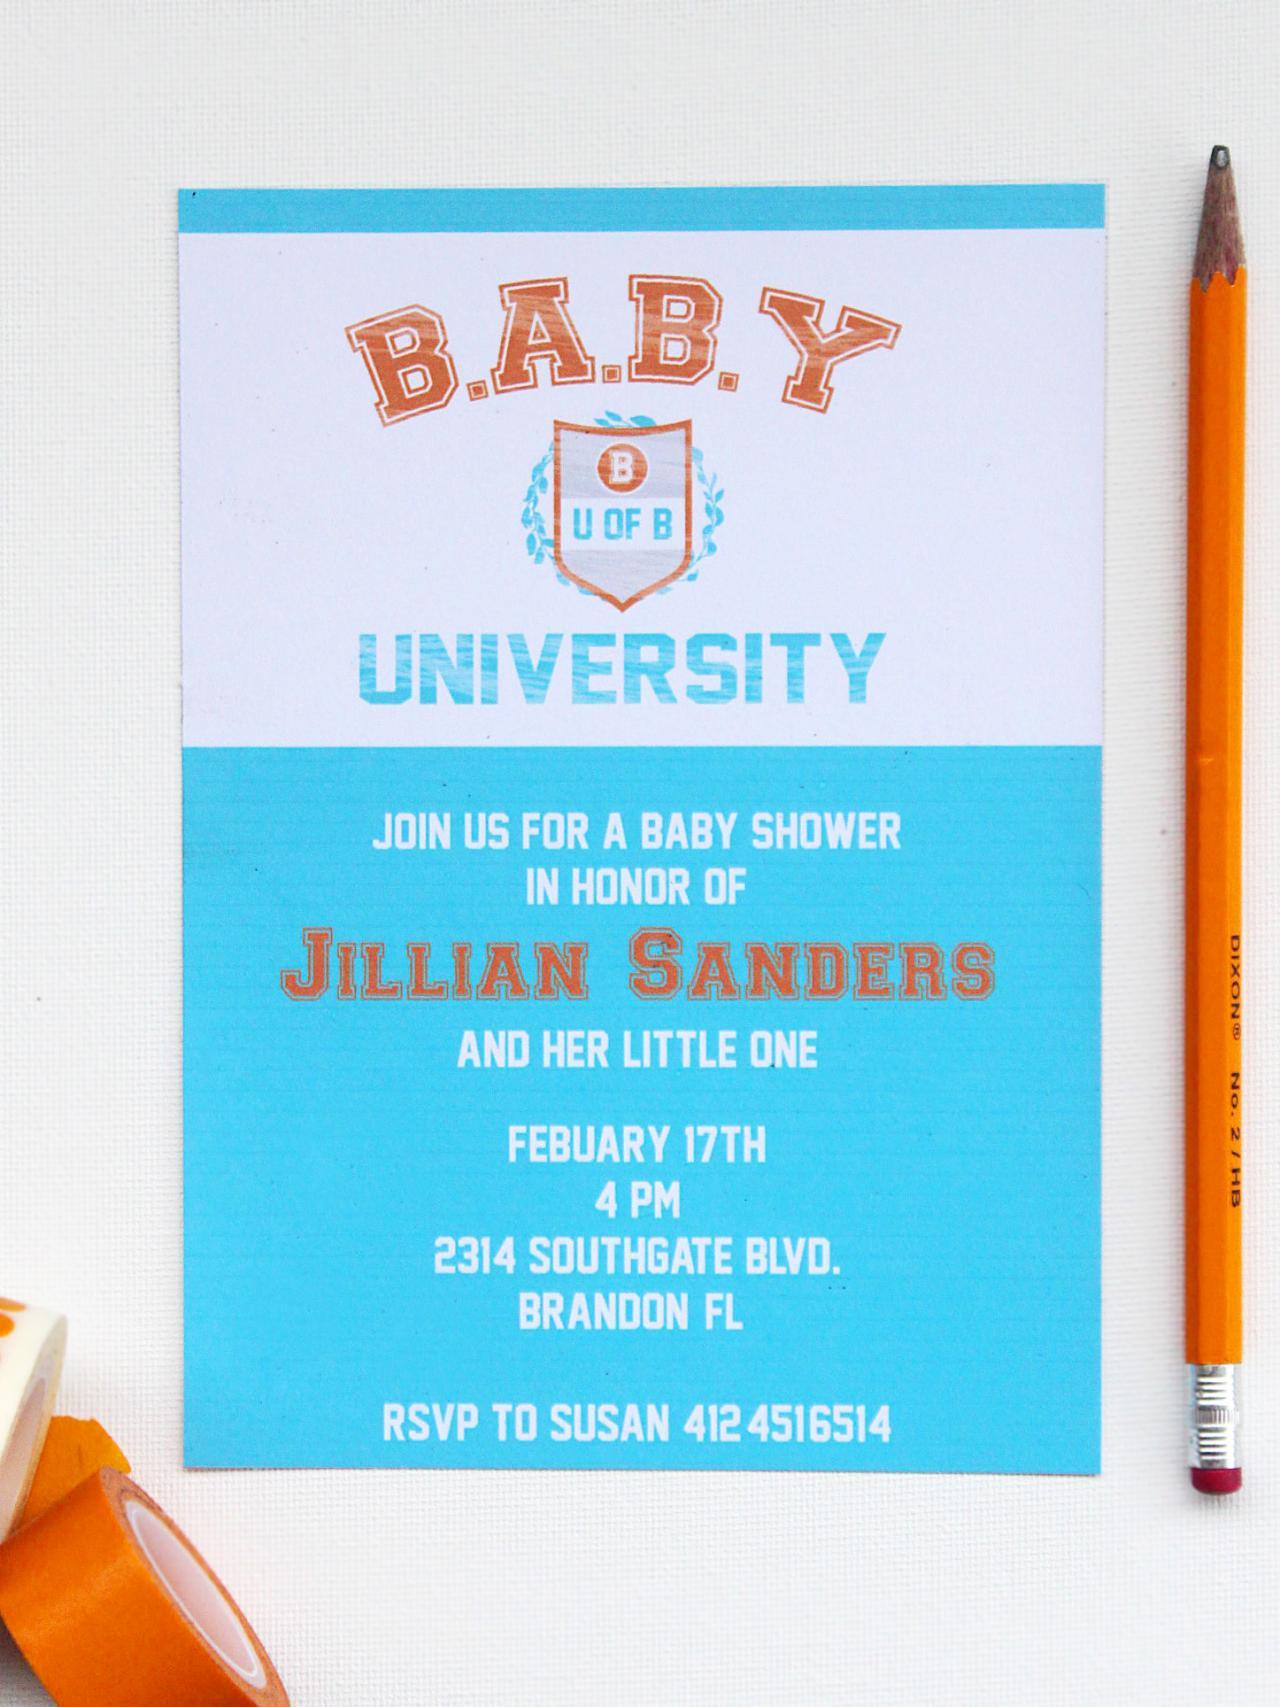 DIY Co ed Baby Shower Ideas DIY Network Blog Made Remade